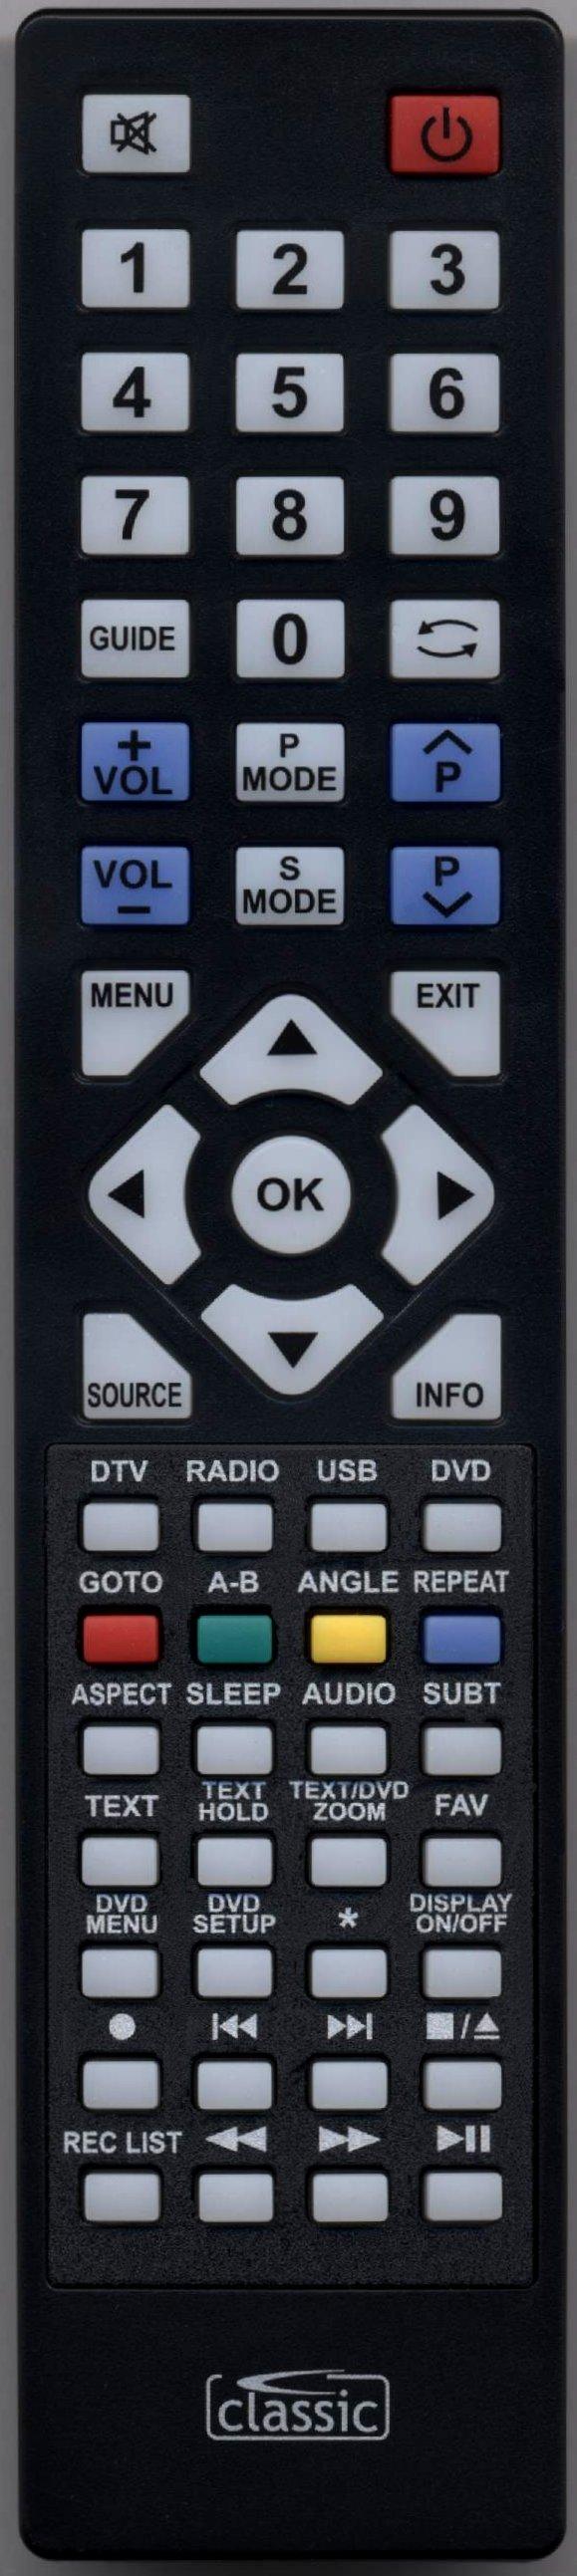 BLAUPUNKT 24/147I-GB-3B-FHKDUP-UK Remote Control Alternative